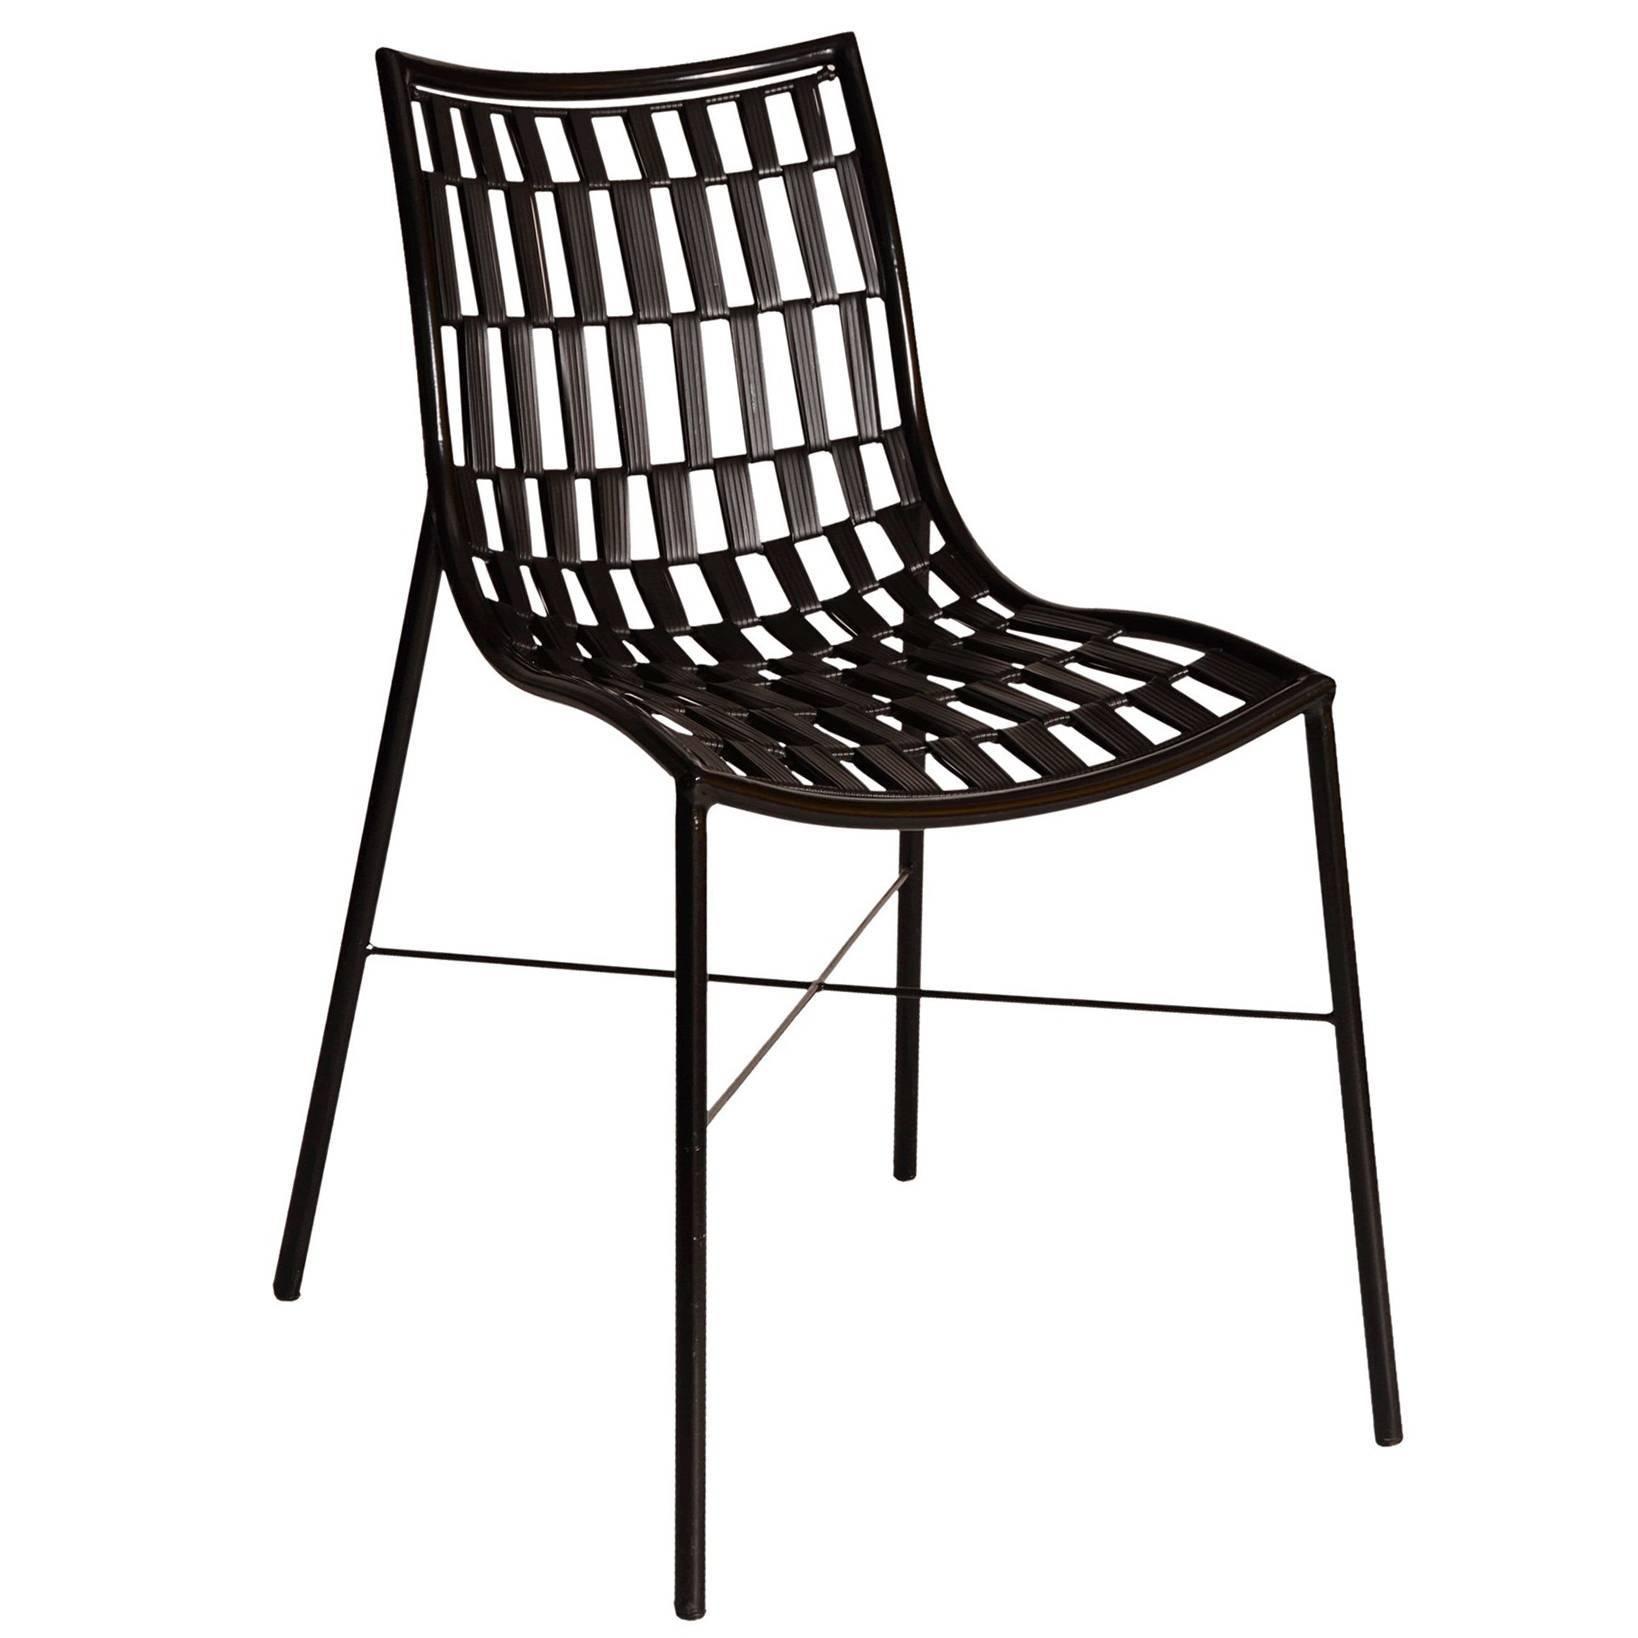 Marambaia Brazilian Contemporary Powder Coated Carbon Steel Chair by Lattoog